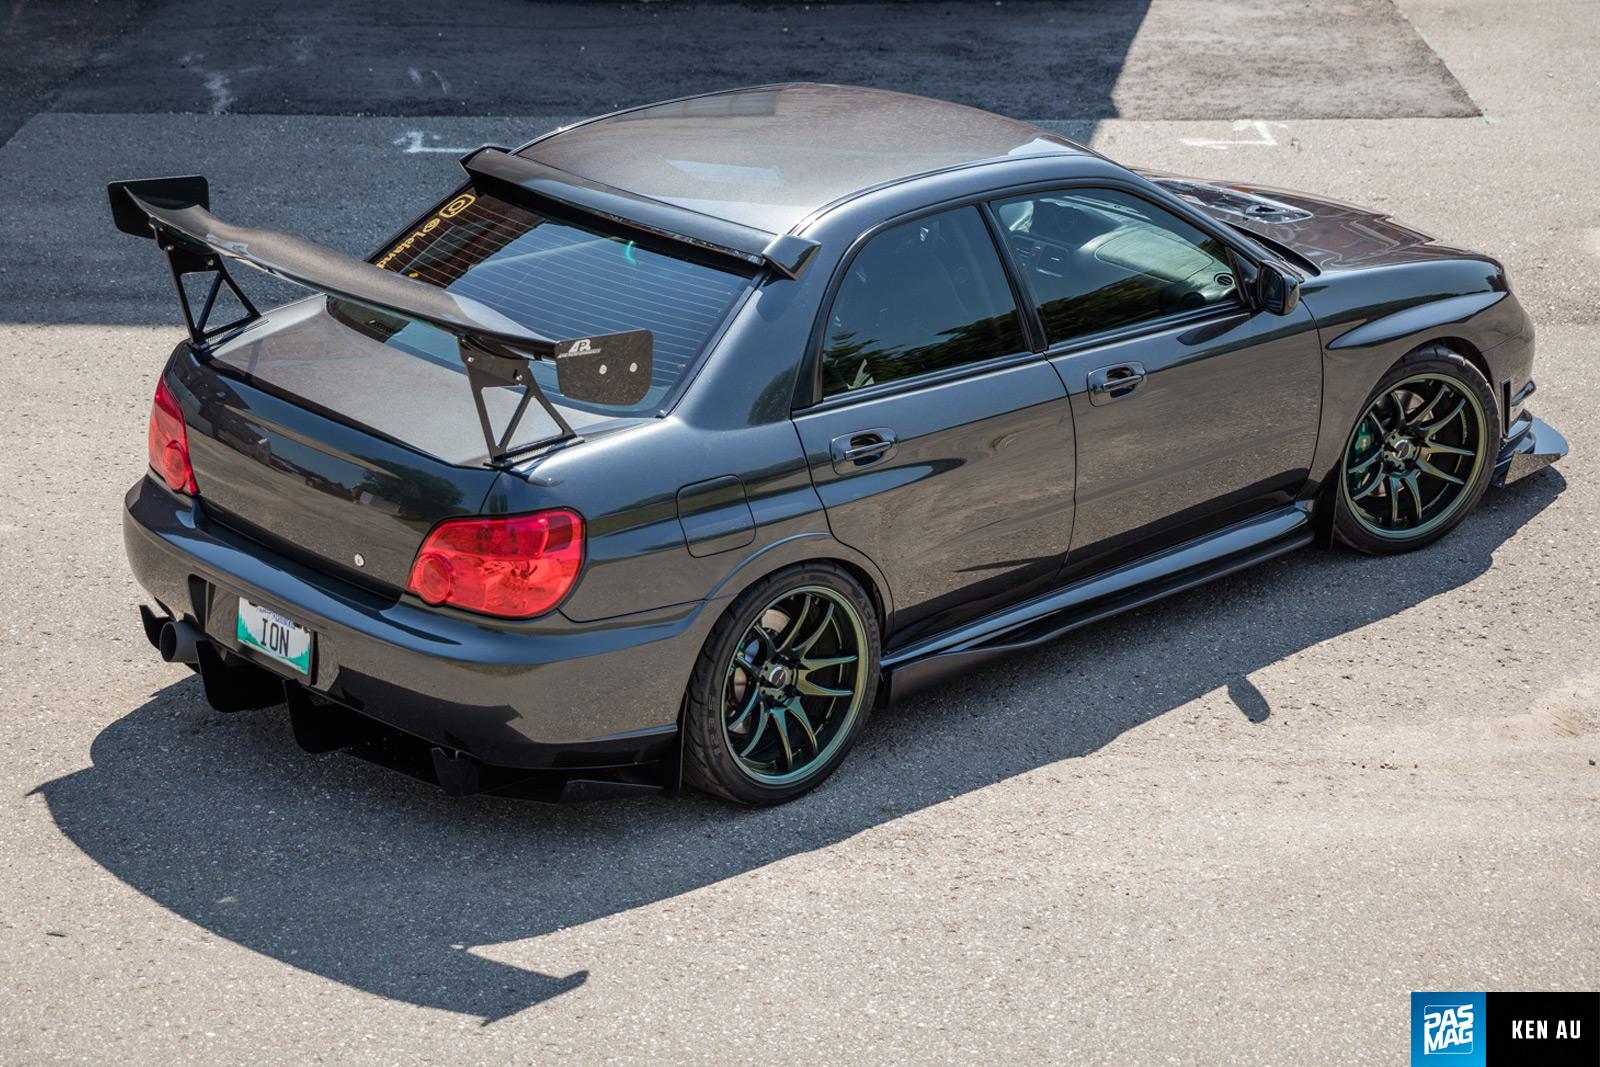 Cobb Accessport V2 >> Hands On: Leland Kirton's 2006 Subaru WRX STI - PASMAG ...